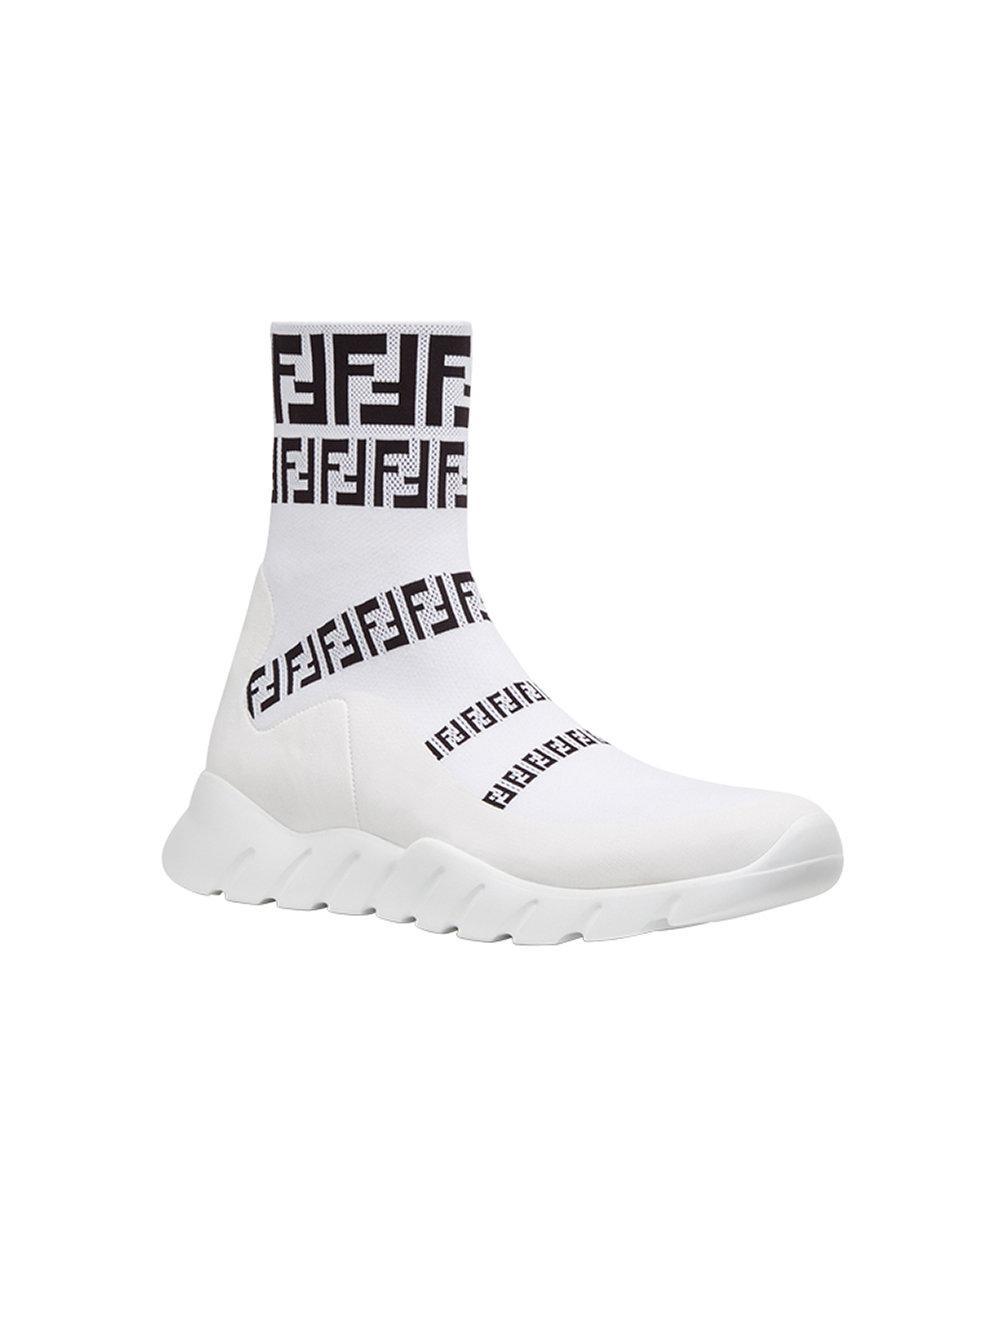 fcdd9ca71fc39 Men s White Slip-on Sock Sneakers